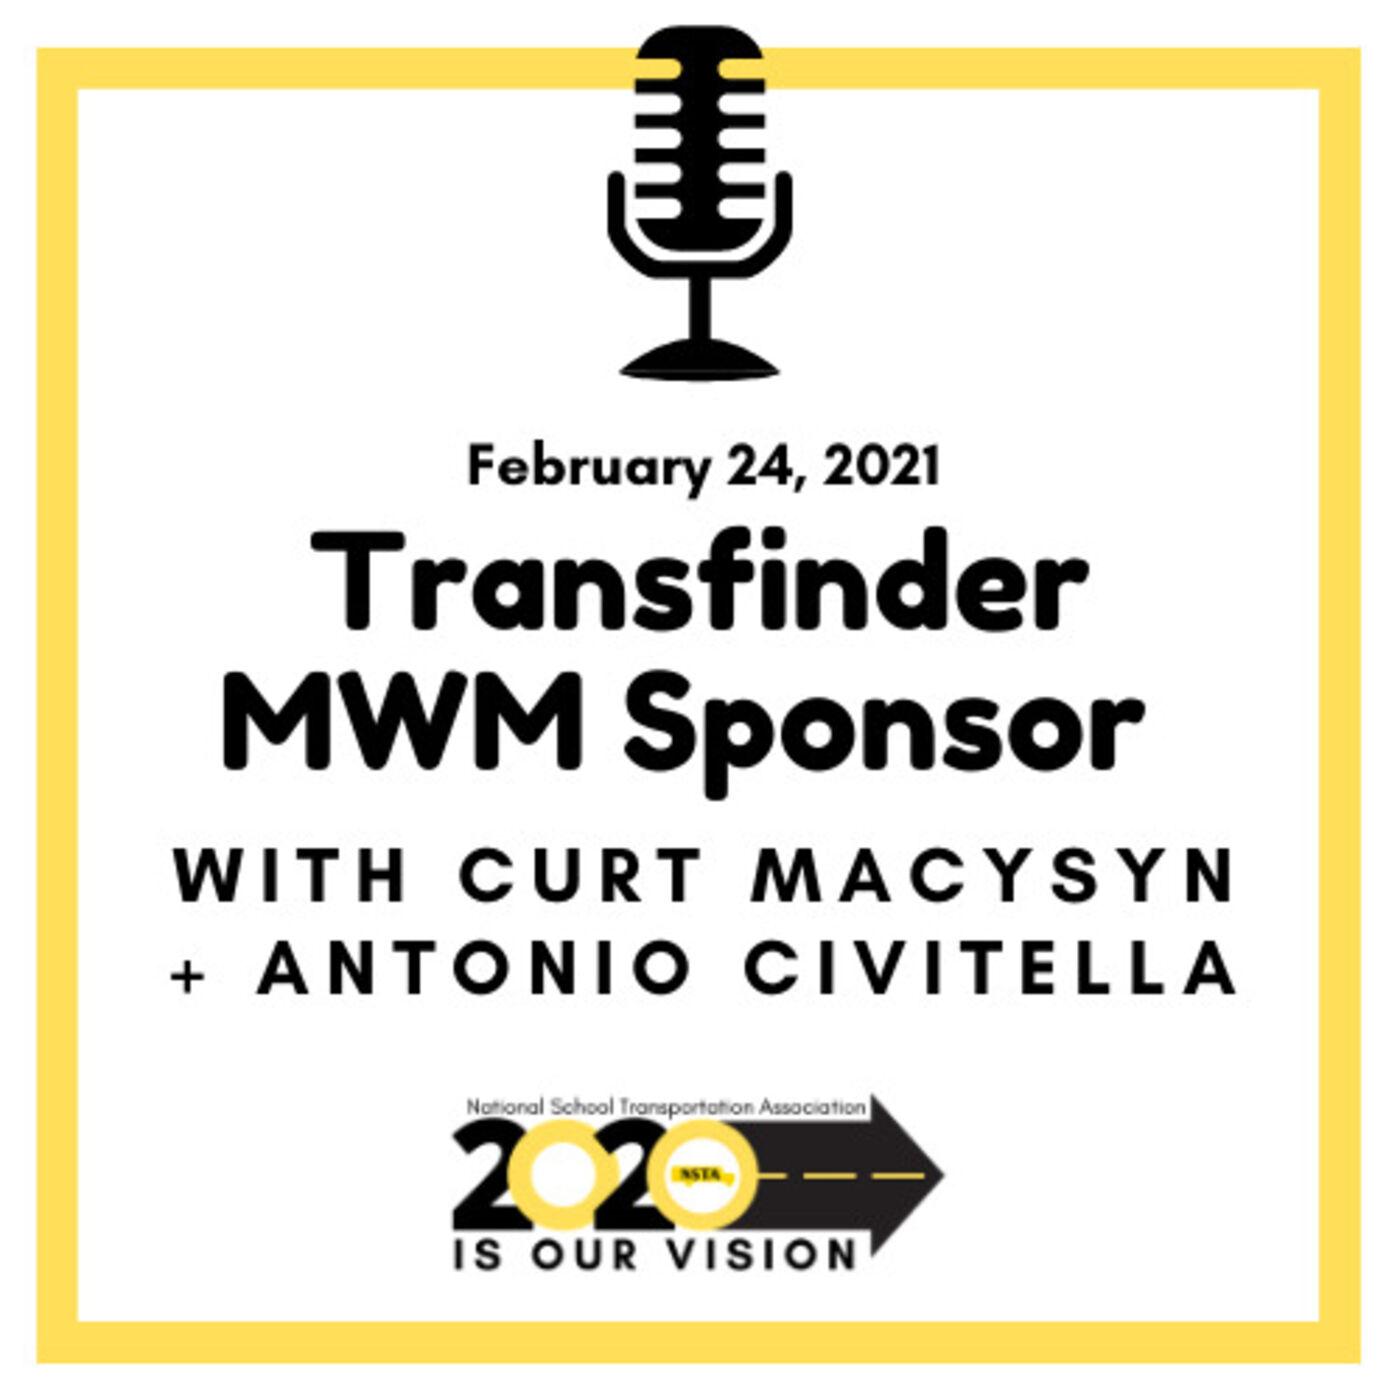 Transfinder-MWM Sponsor:  Antonio Civitella CEO